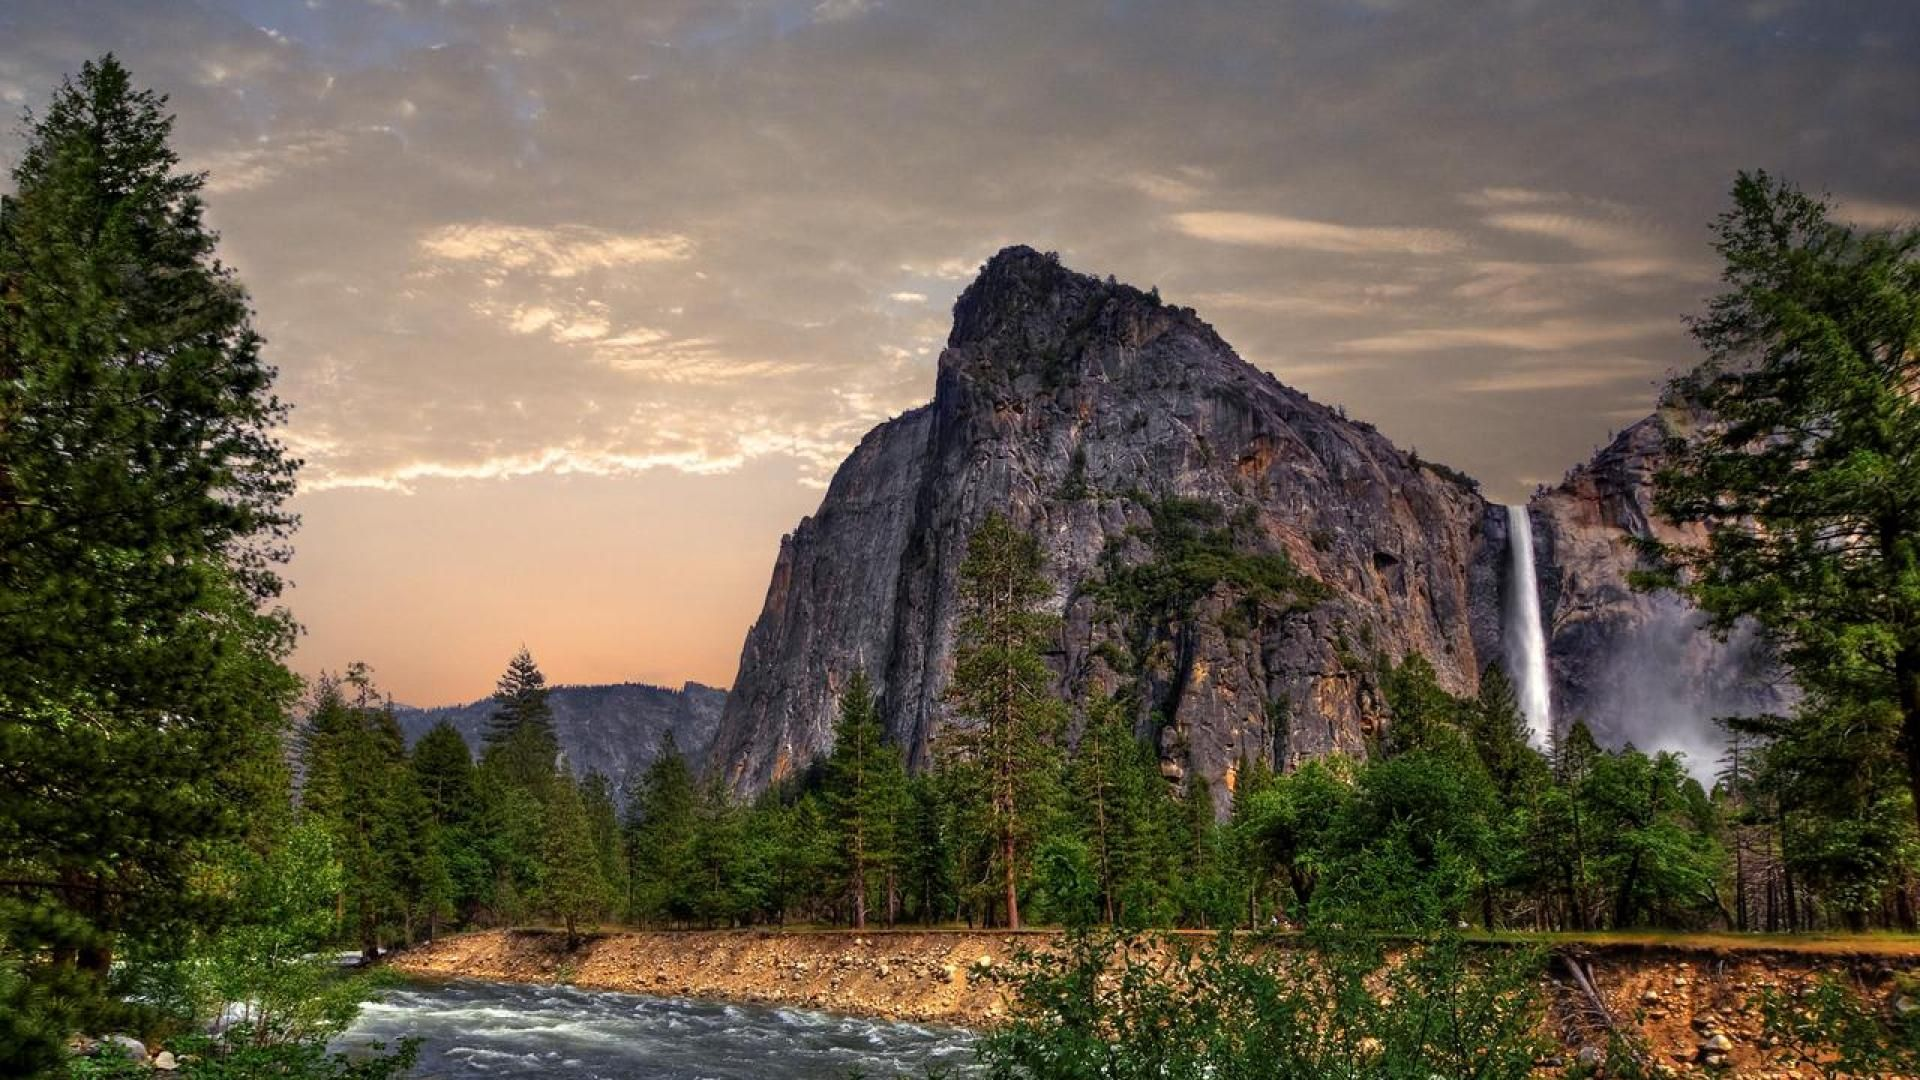 Yosemite free download wallpaper